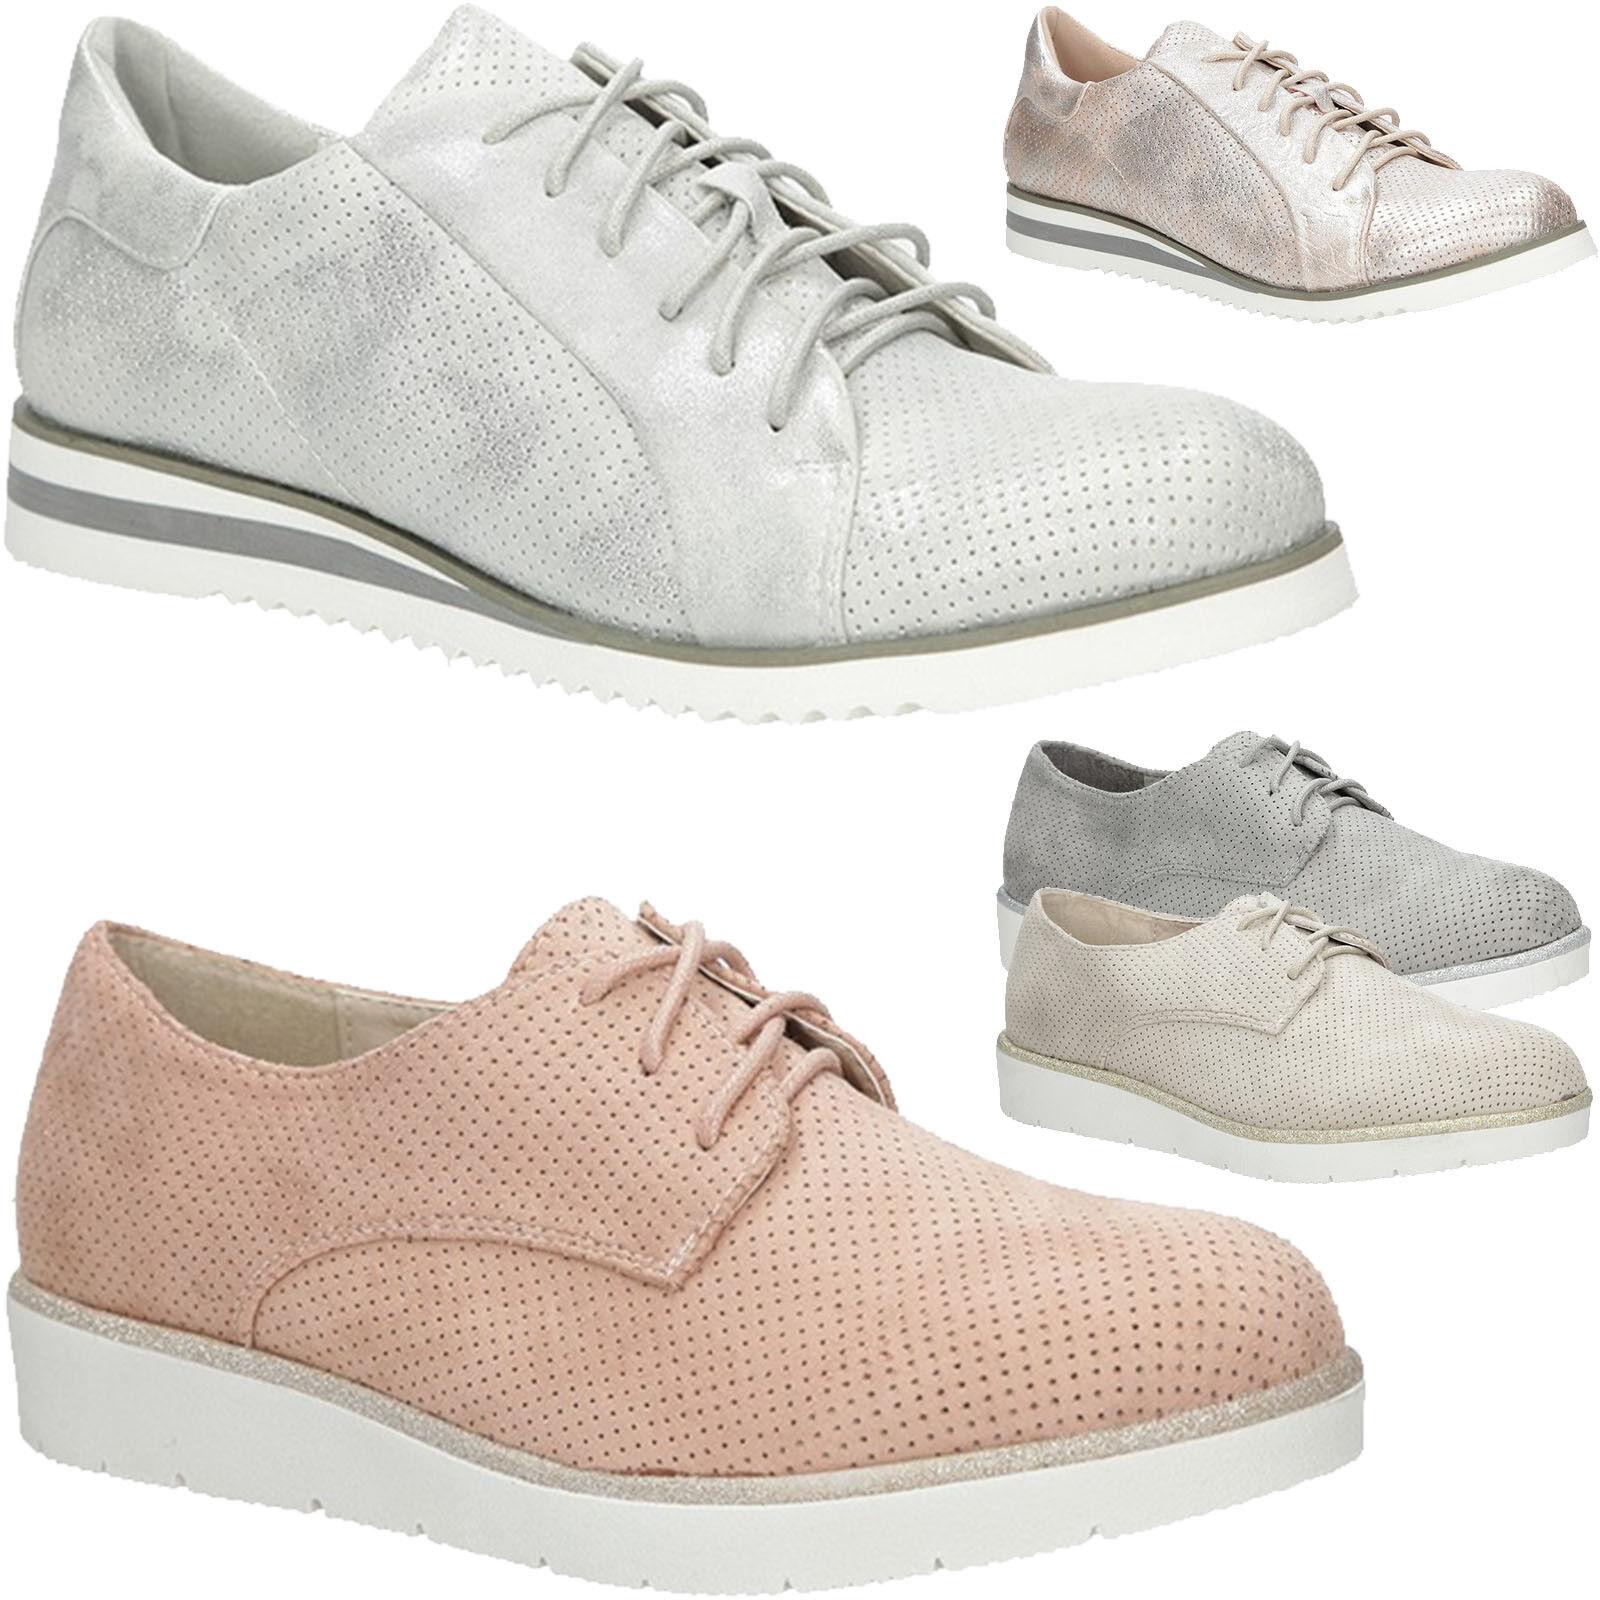 Damen Halb zapatos Beqeum  Plateau Keilabsatz Schnürer Elegant Beqeum zapatos Gr. 36-41 NEUHEIT 712464